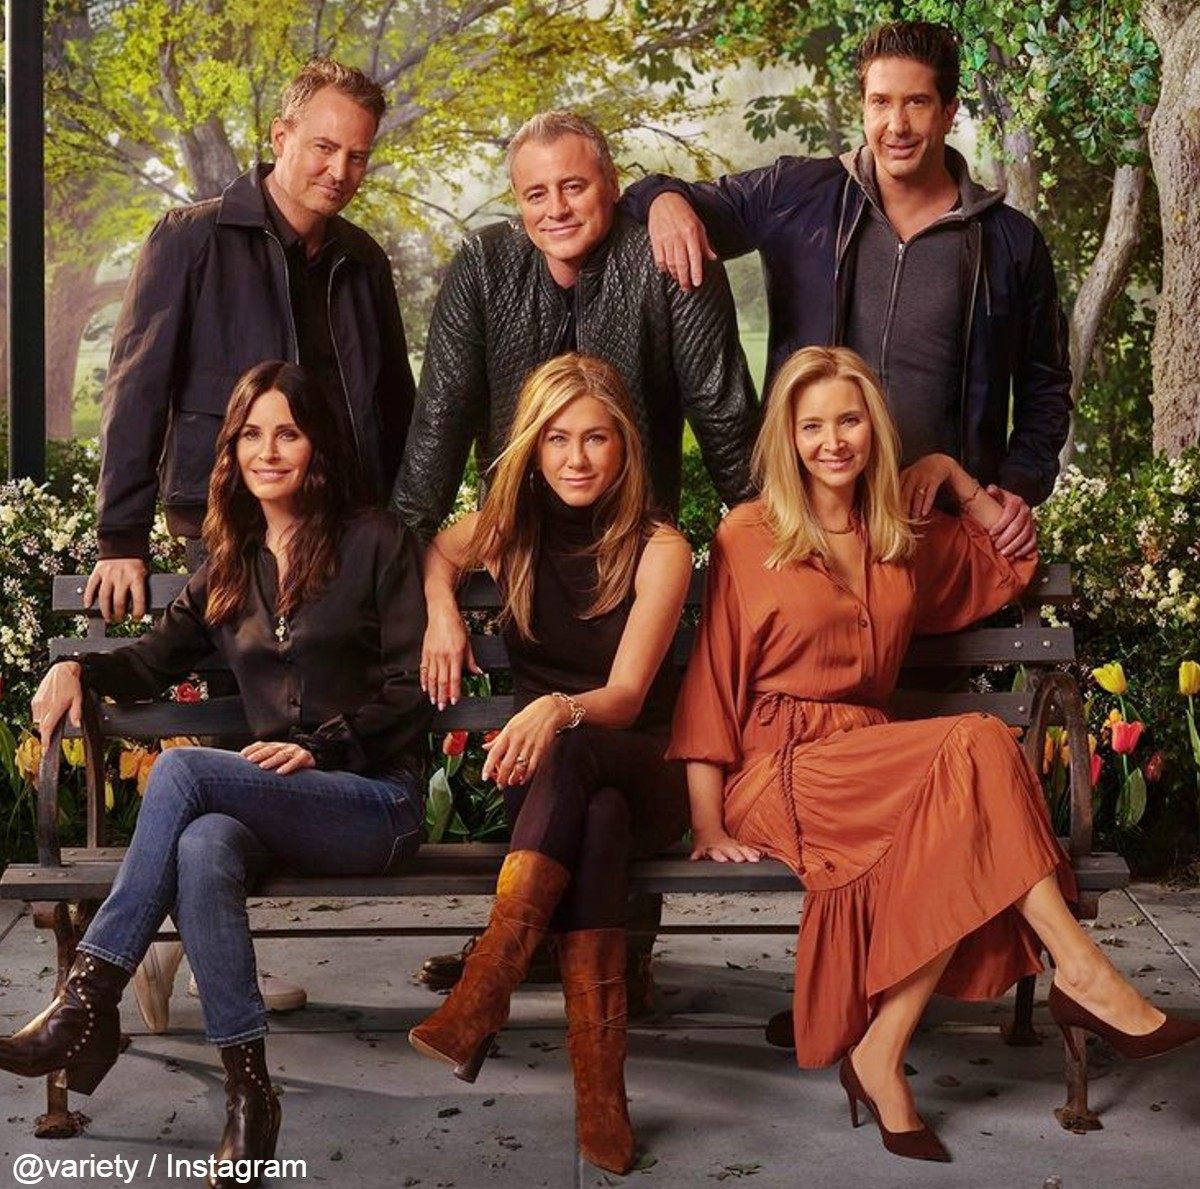 「Friends: The Reunion」公式ビジュアル